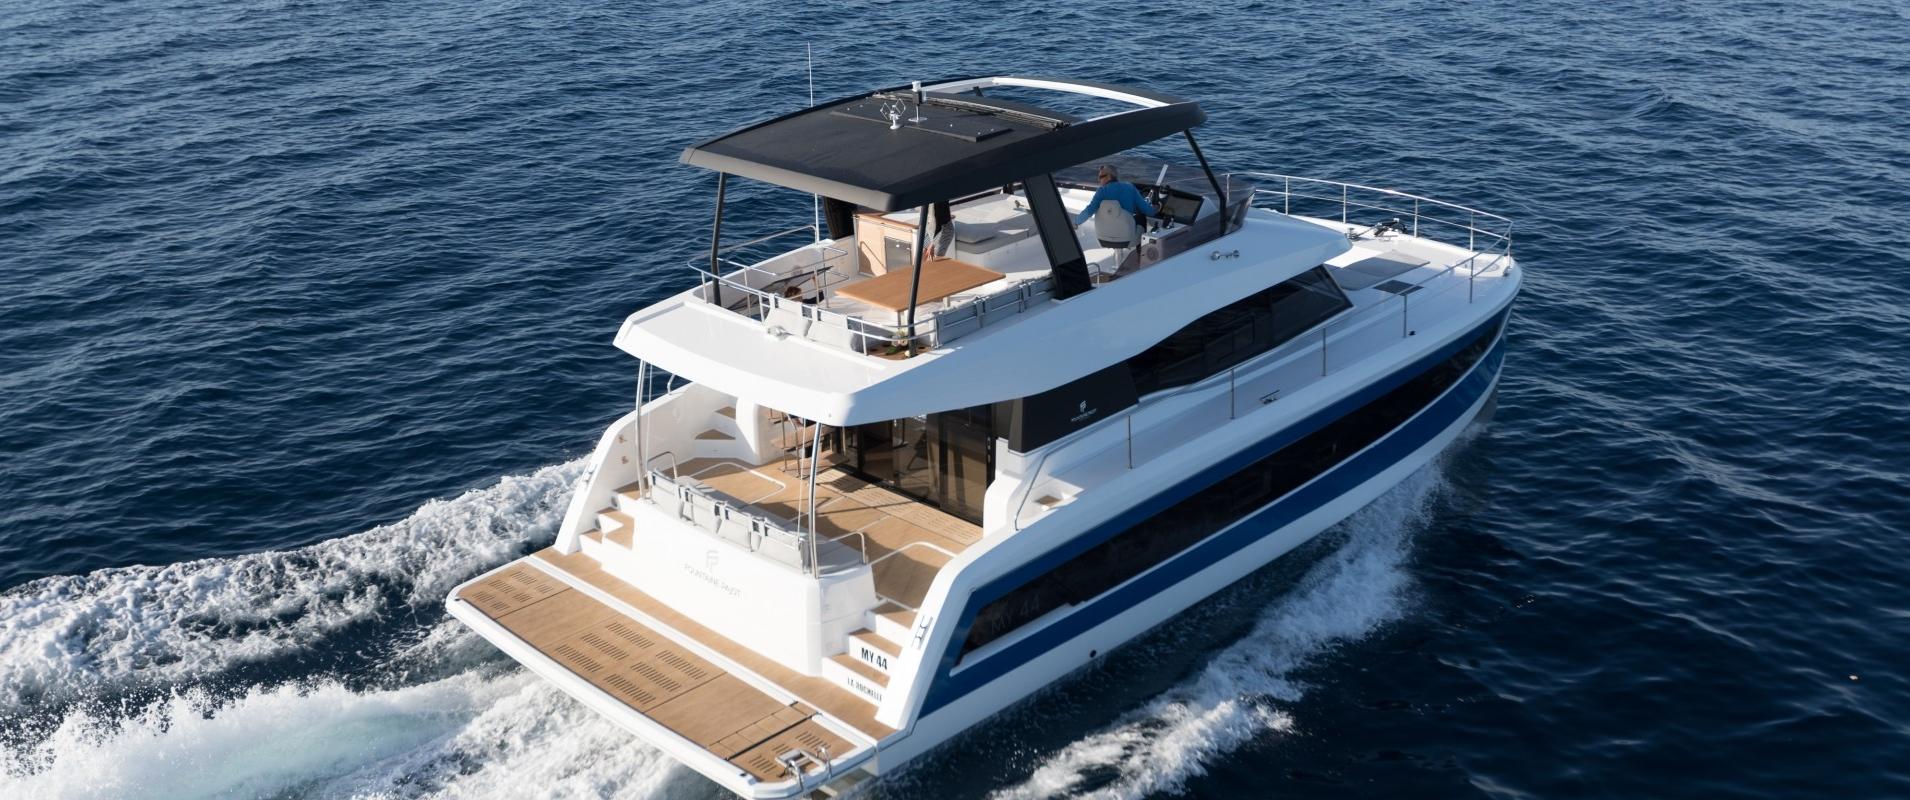 Catamaran Power Hull Plans